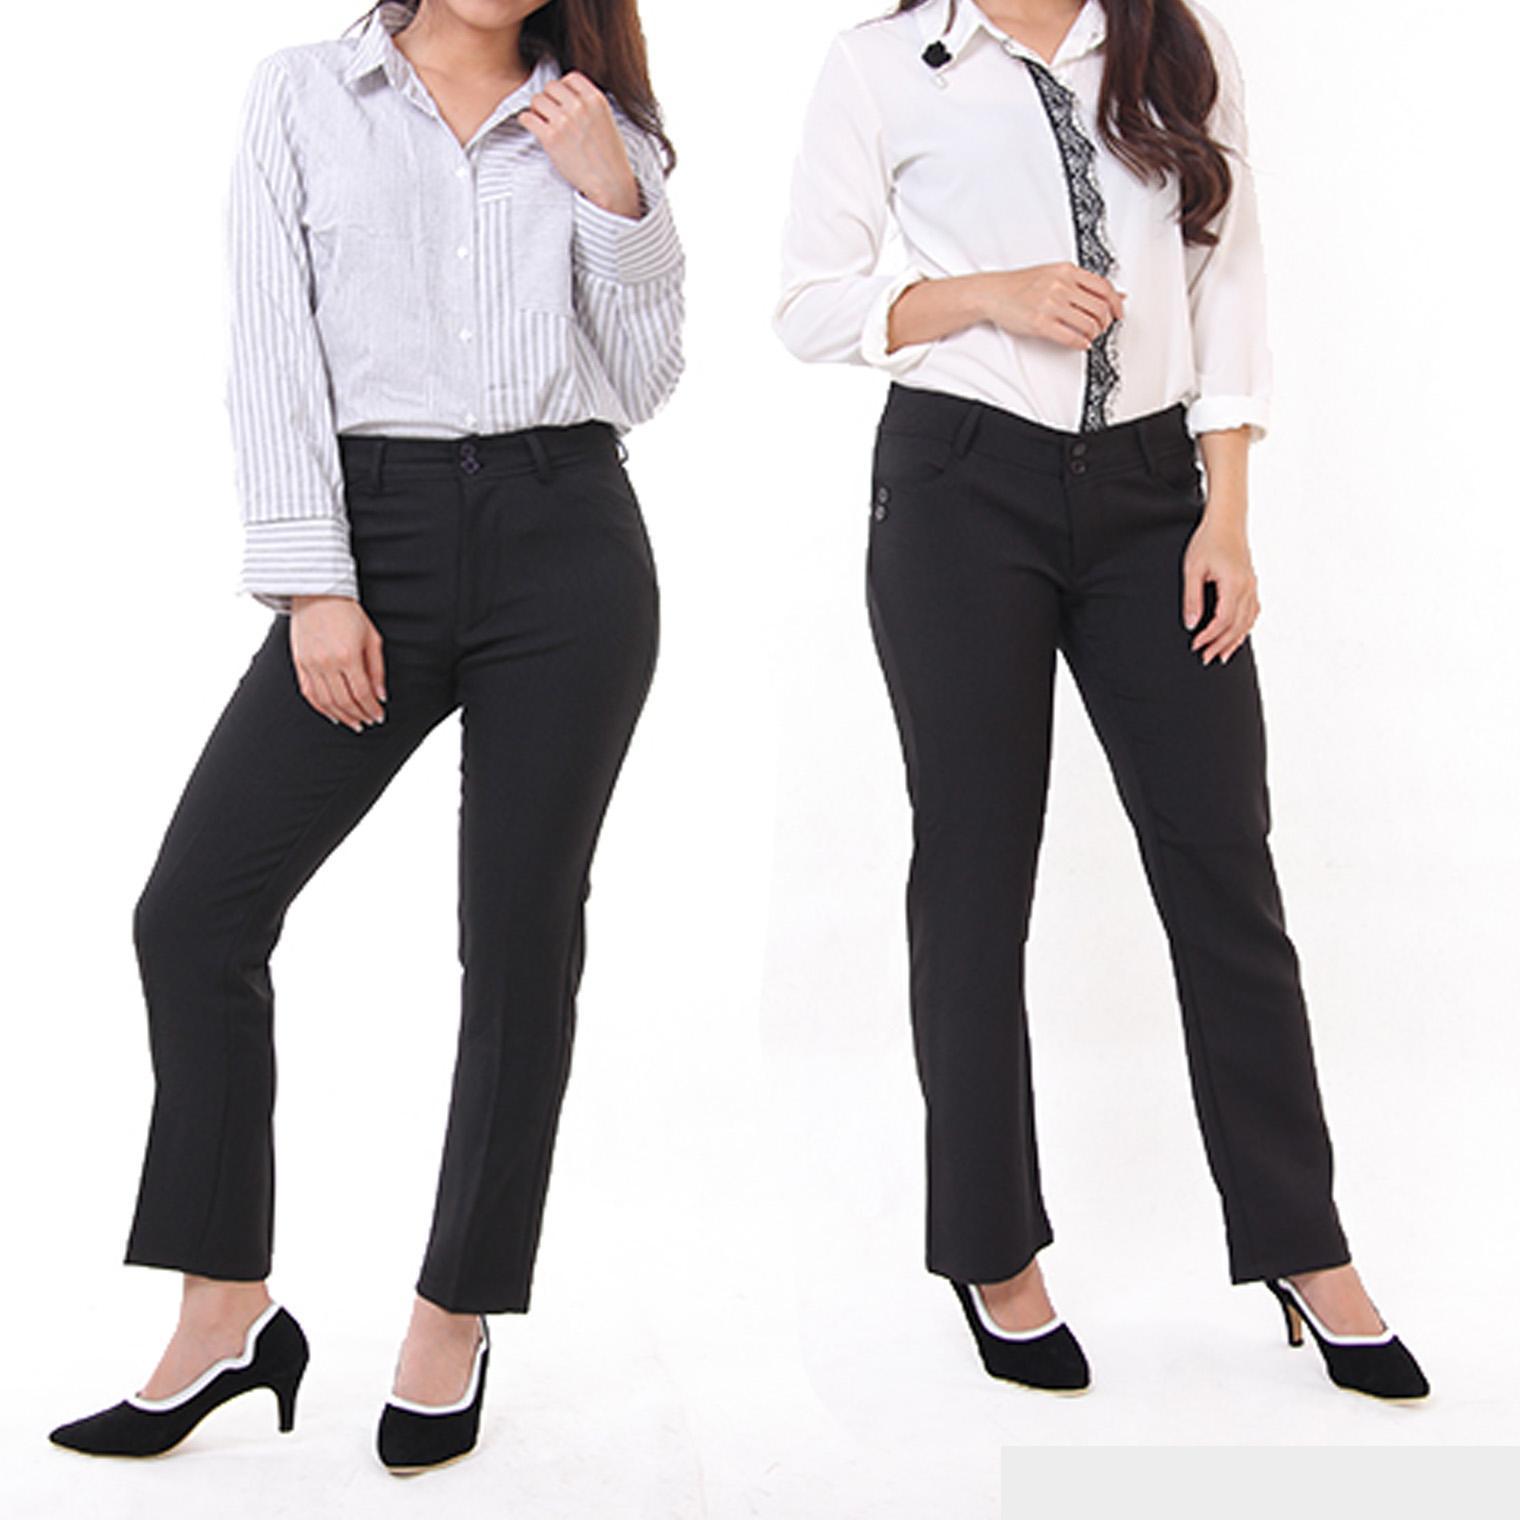 Celana Kerja Kantor Wanita Slim Fit Lurus Hitam Abu Abu dan Biru Dongker